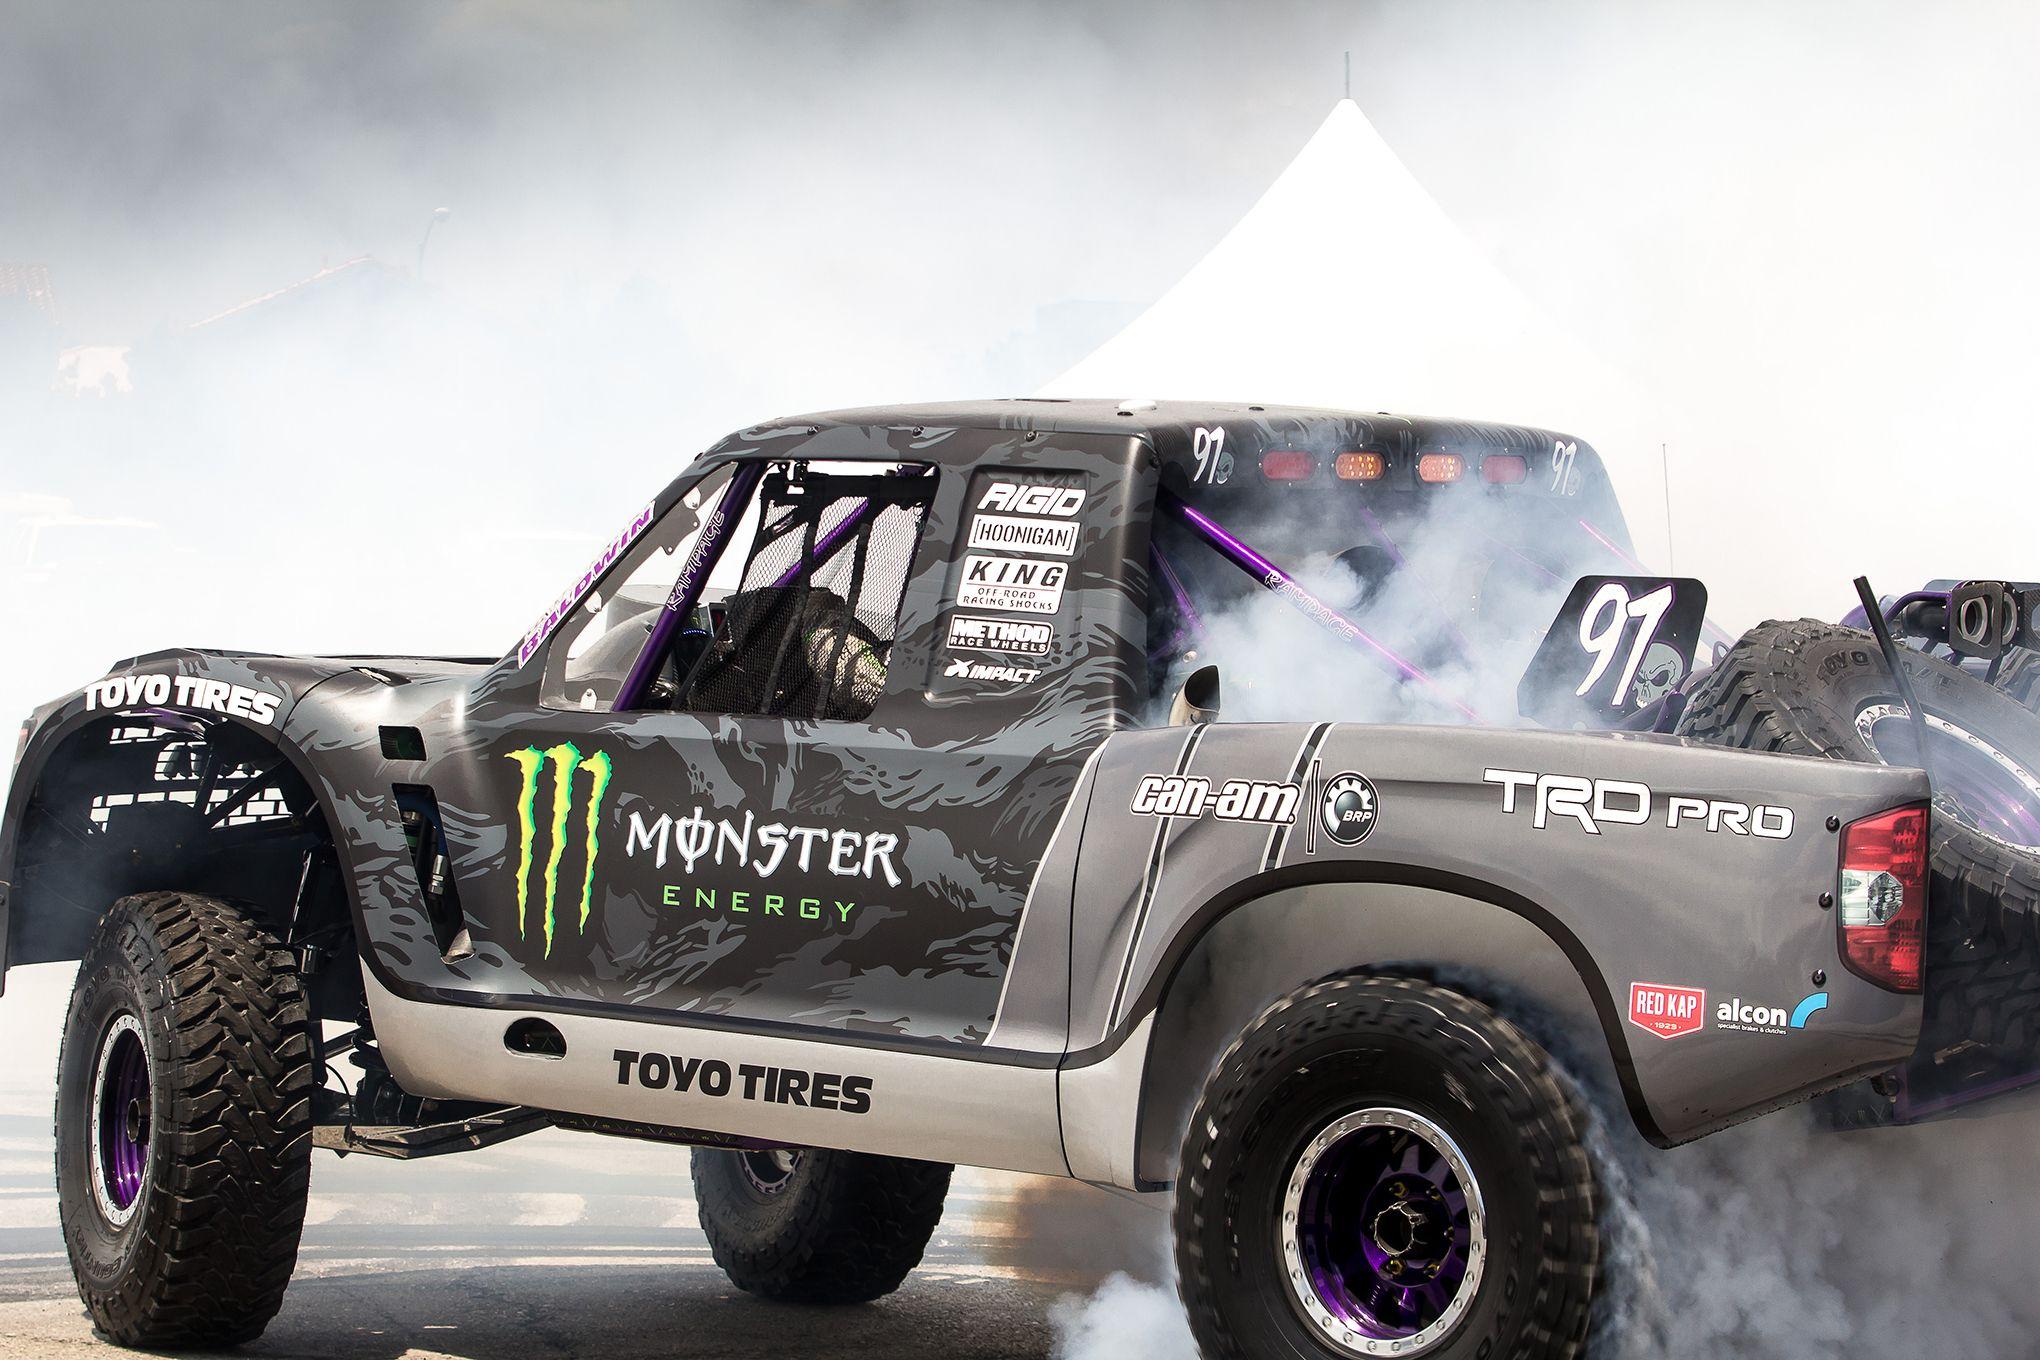 toyota-bj-baldwin-tundra-trd-pro-trophy-truck-006